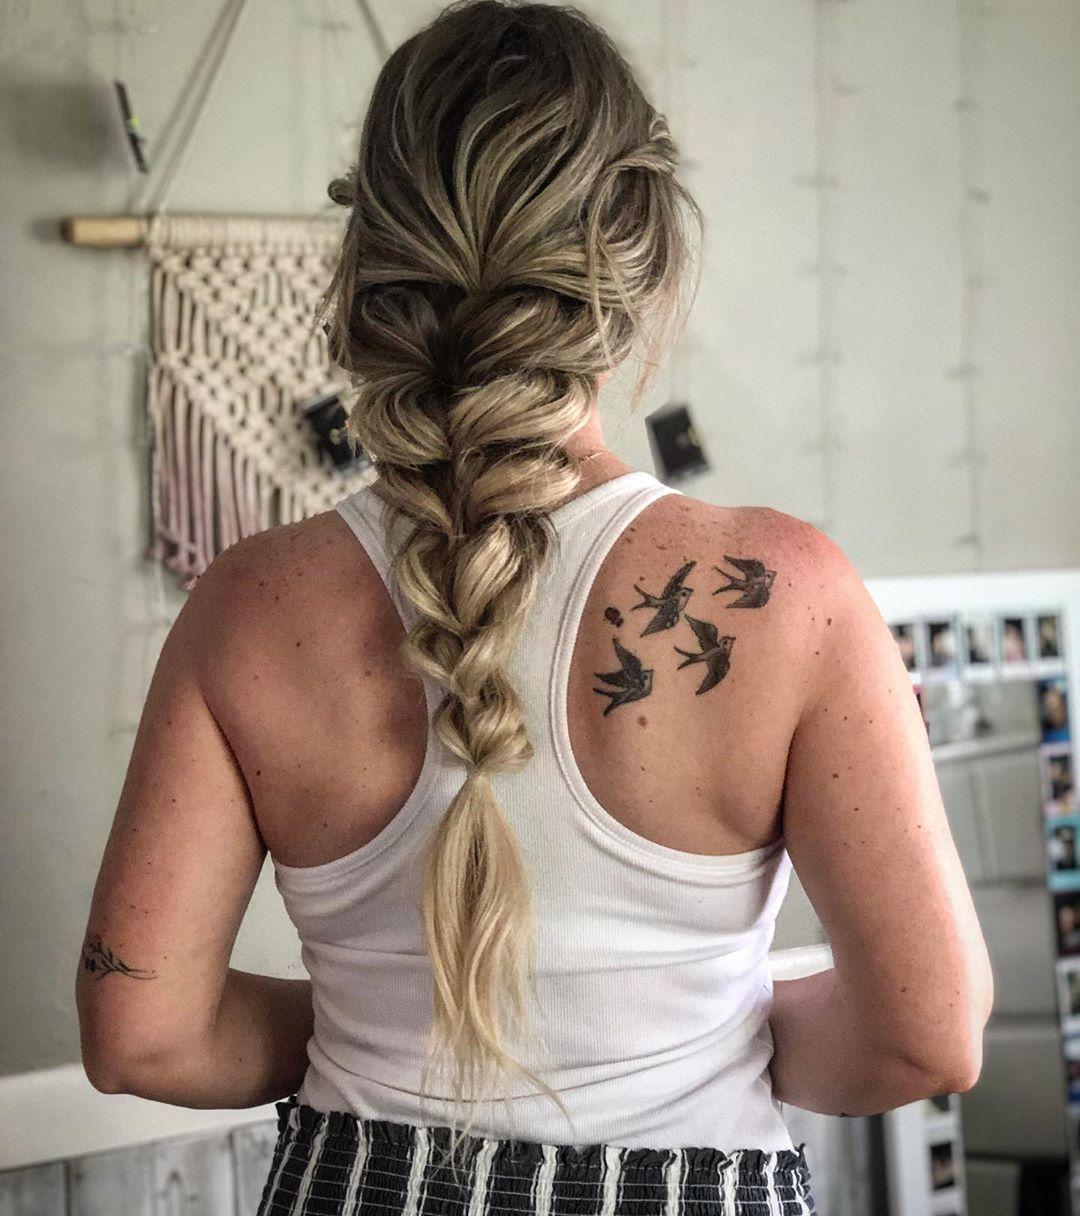 Chunky french braid with a bohemian braid flair